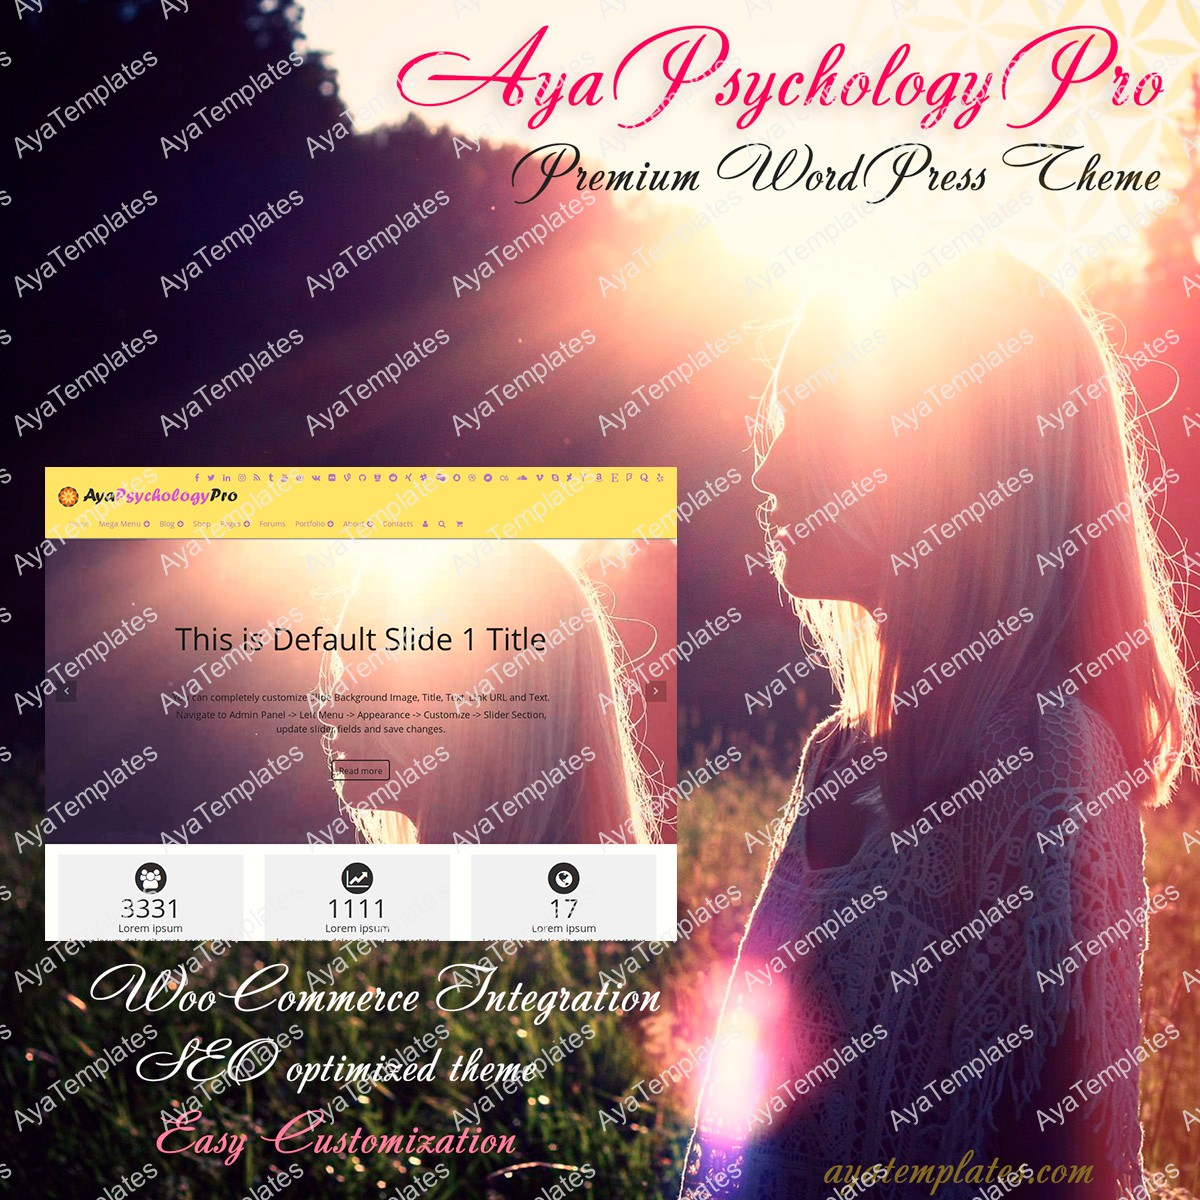 ayapsychologypro-premium-wordpress-theme-collage-ayatemplates-com